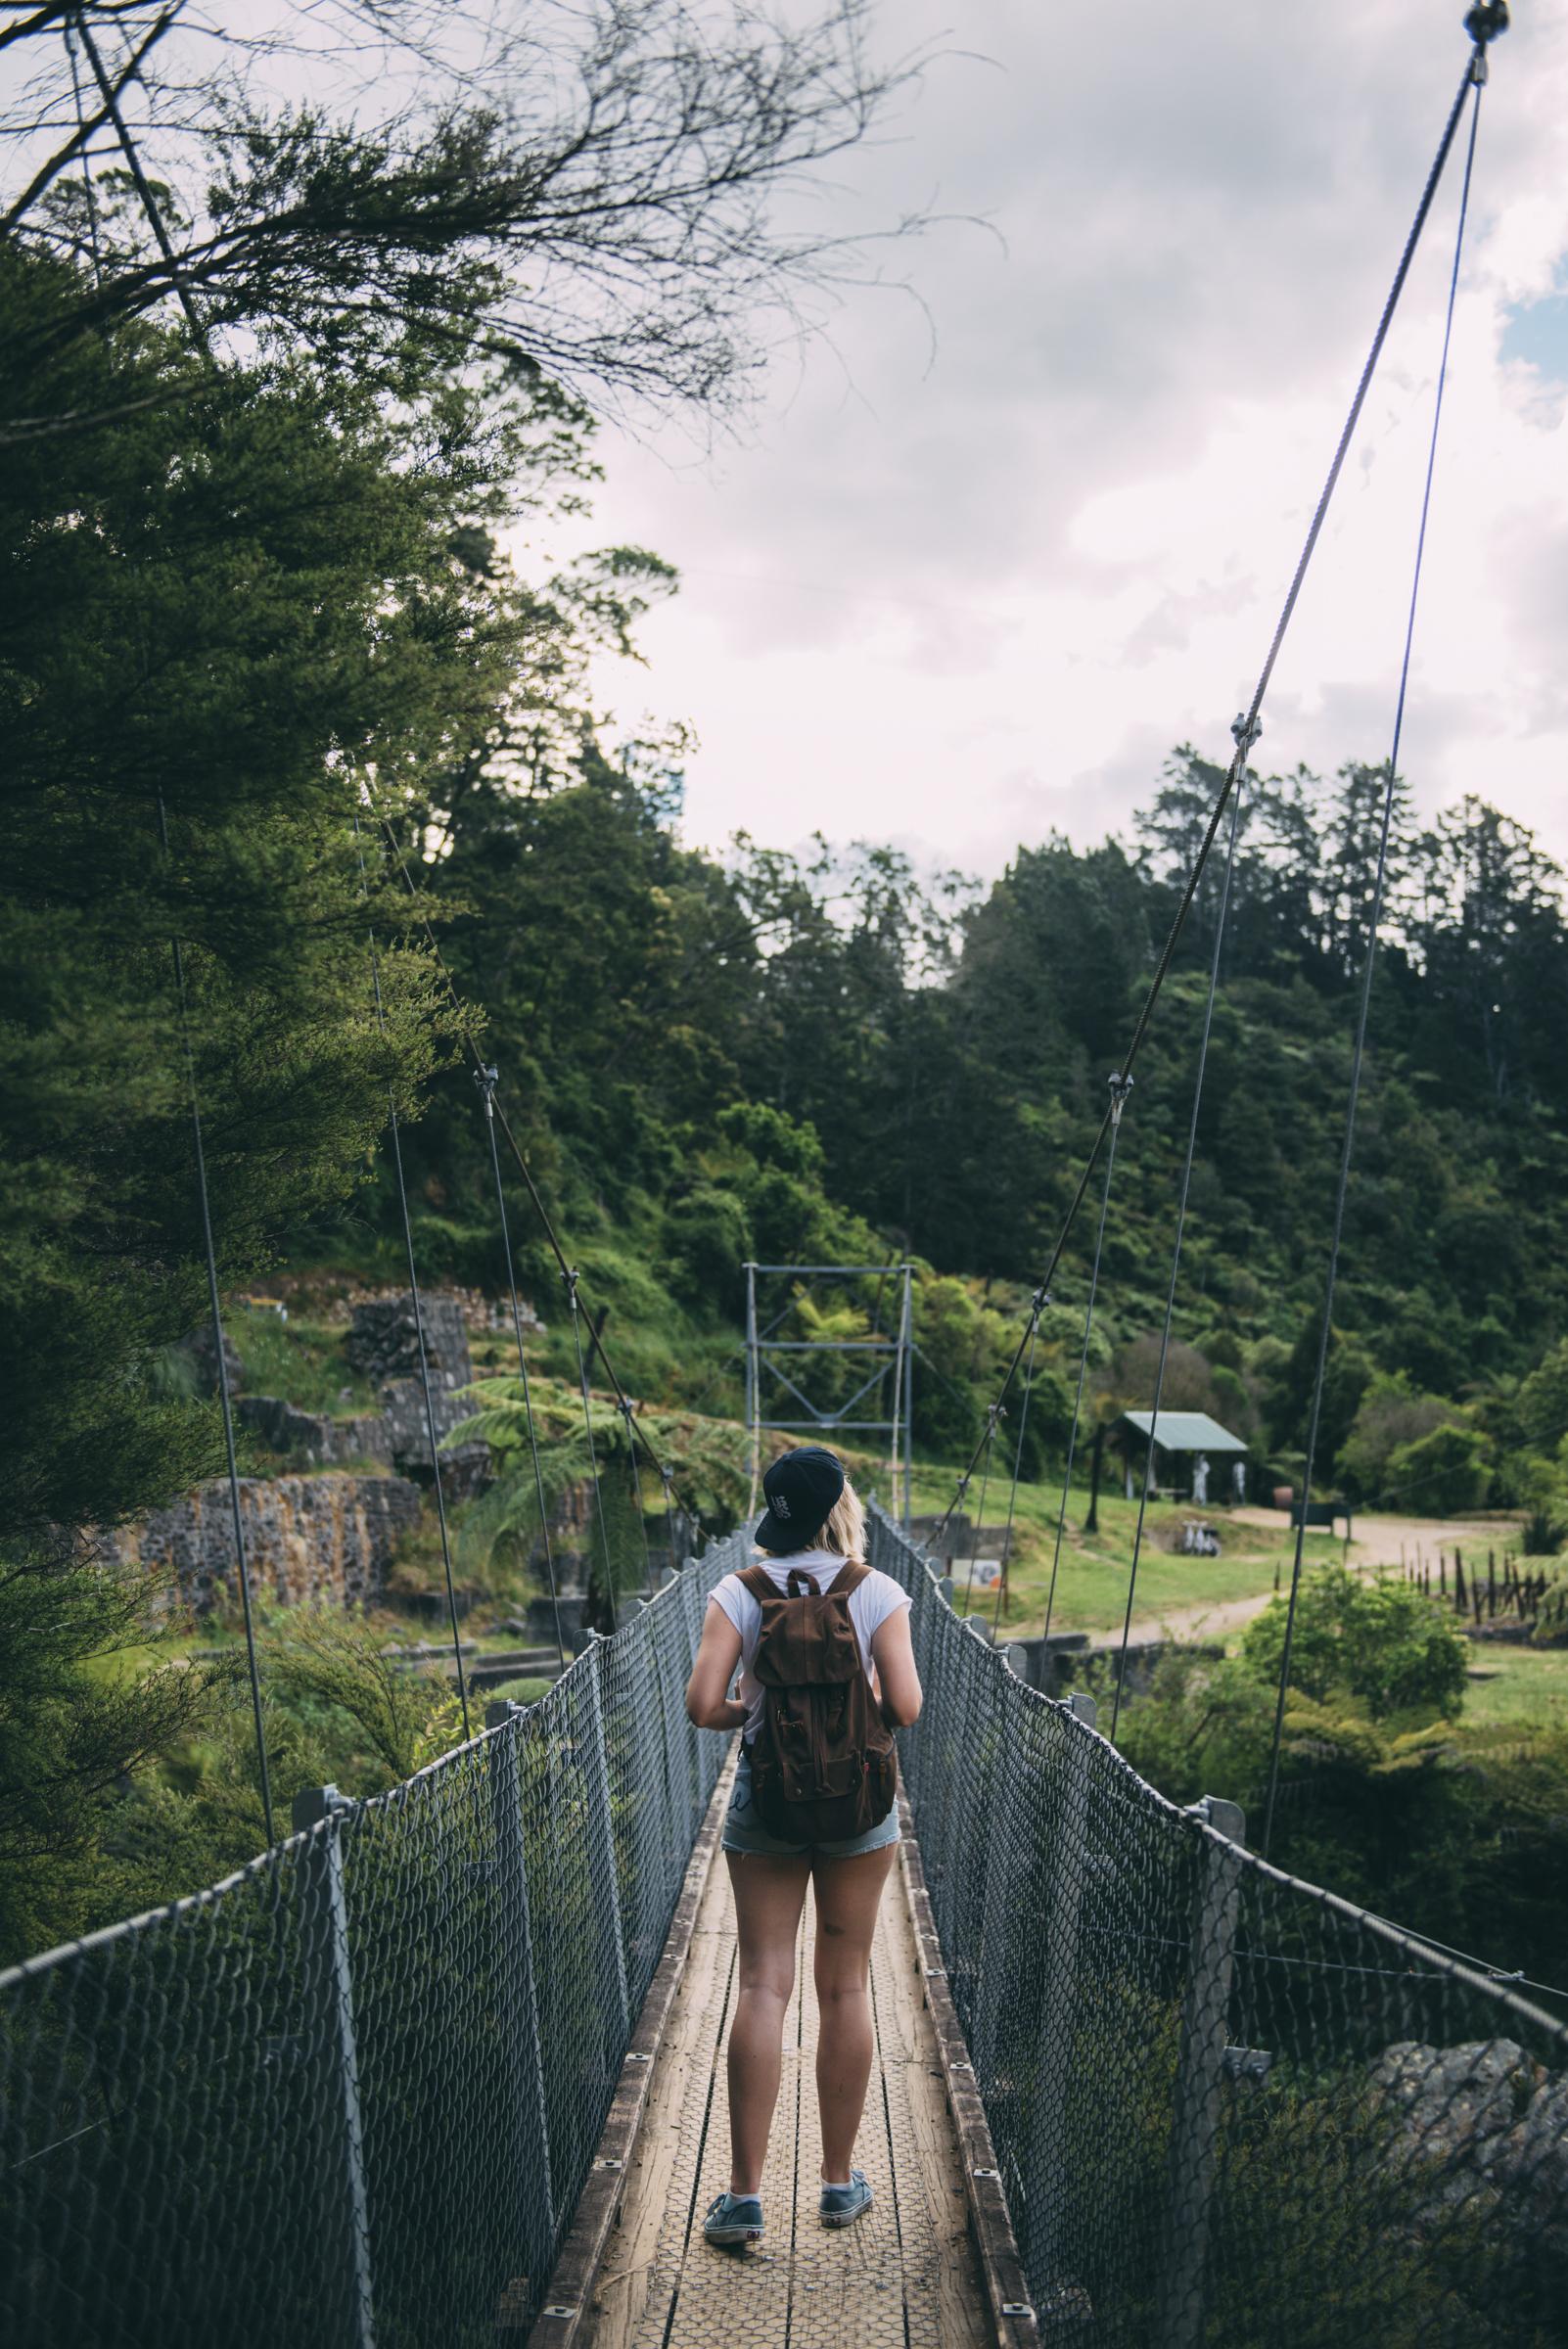 New Zealand Road Trip Lola Photography WEB_019.jpg